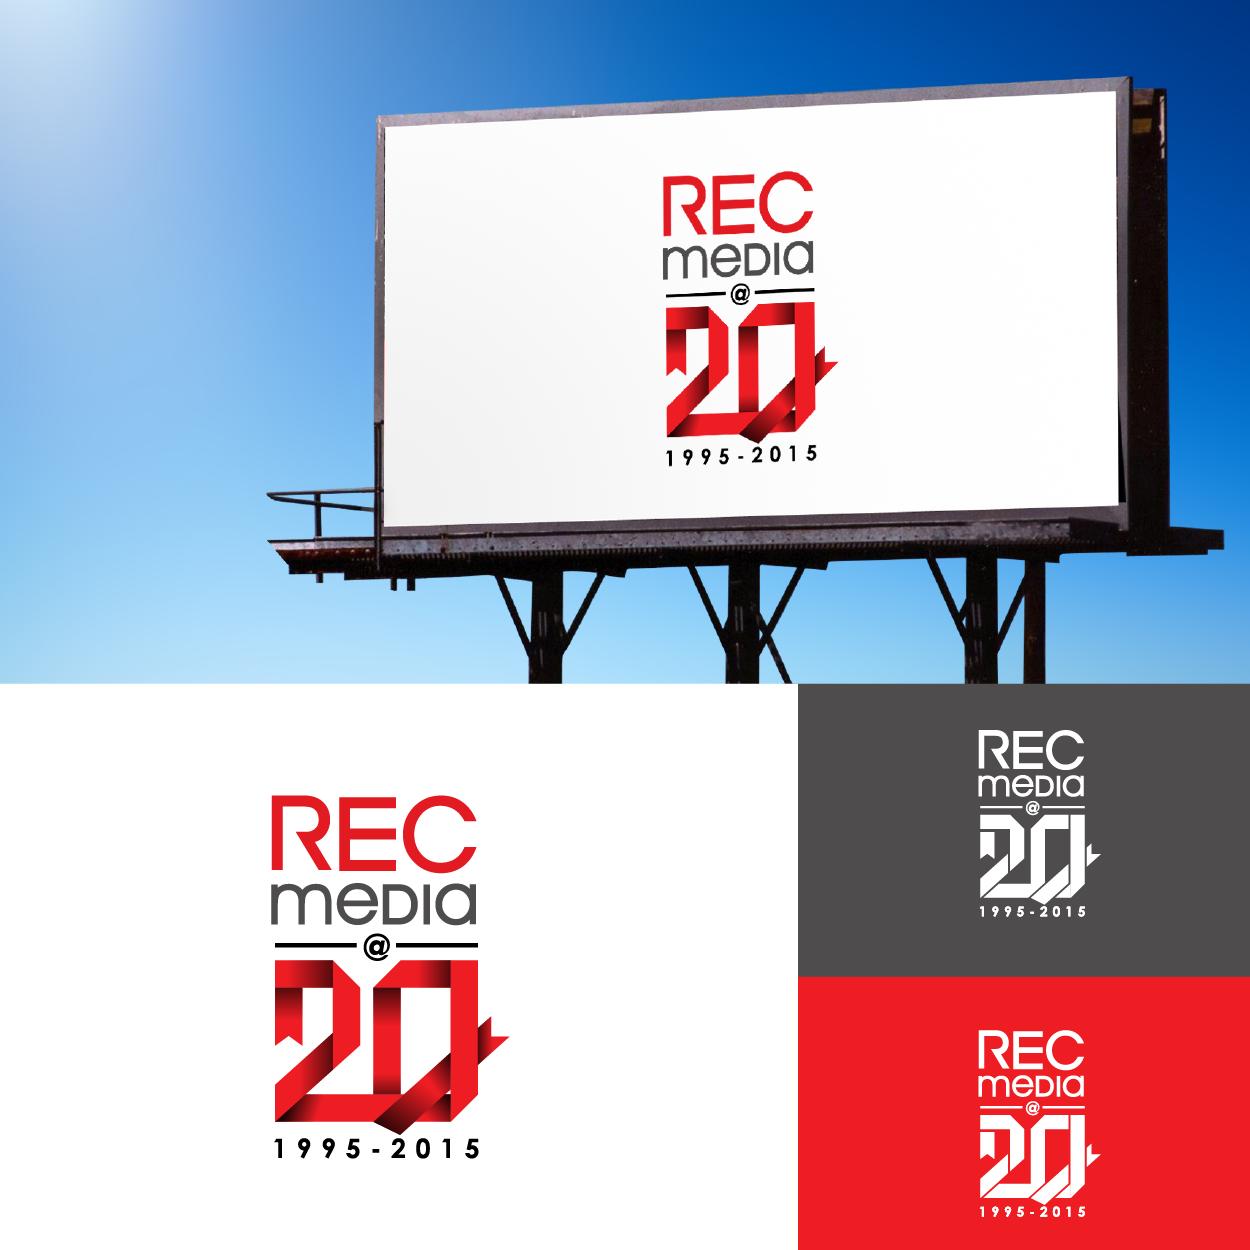 Logo Design by Josephope Sardalla - Entry No. 48 in the Logo Design Contest REC Media Logo Design.